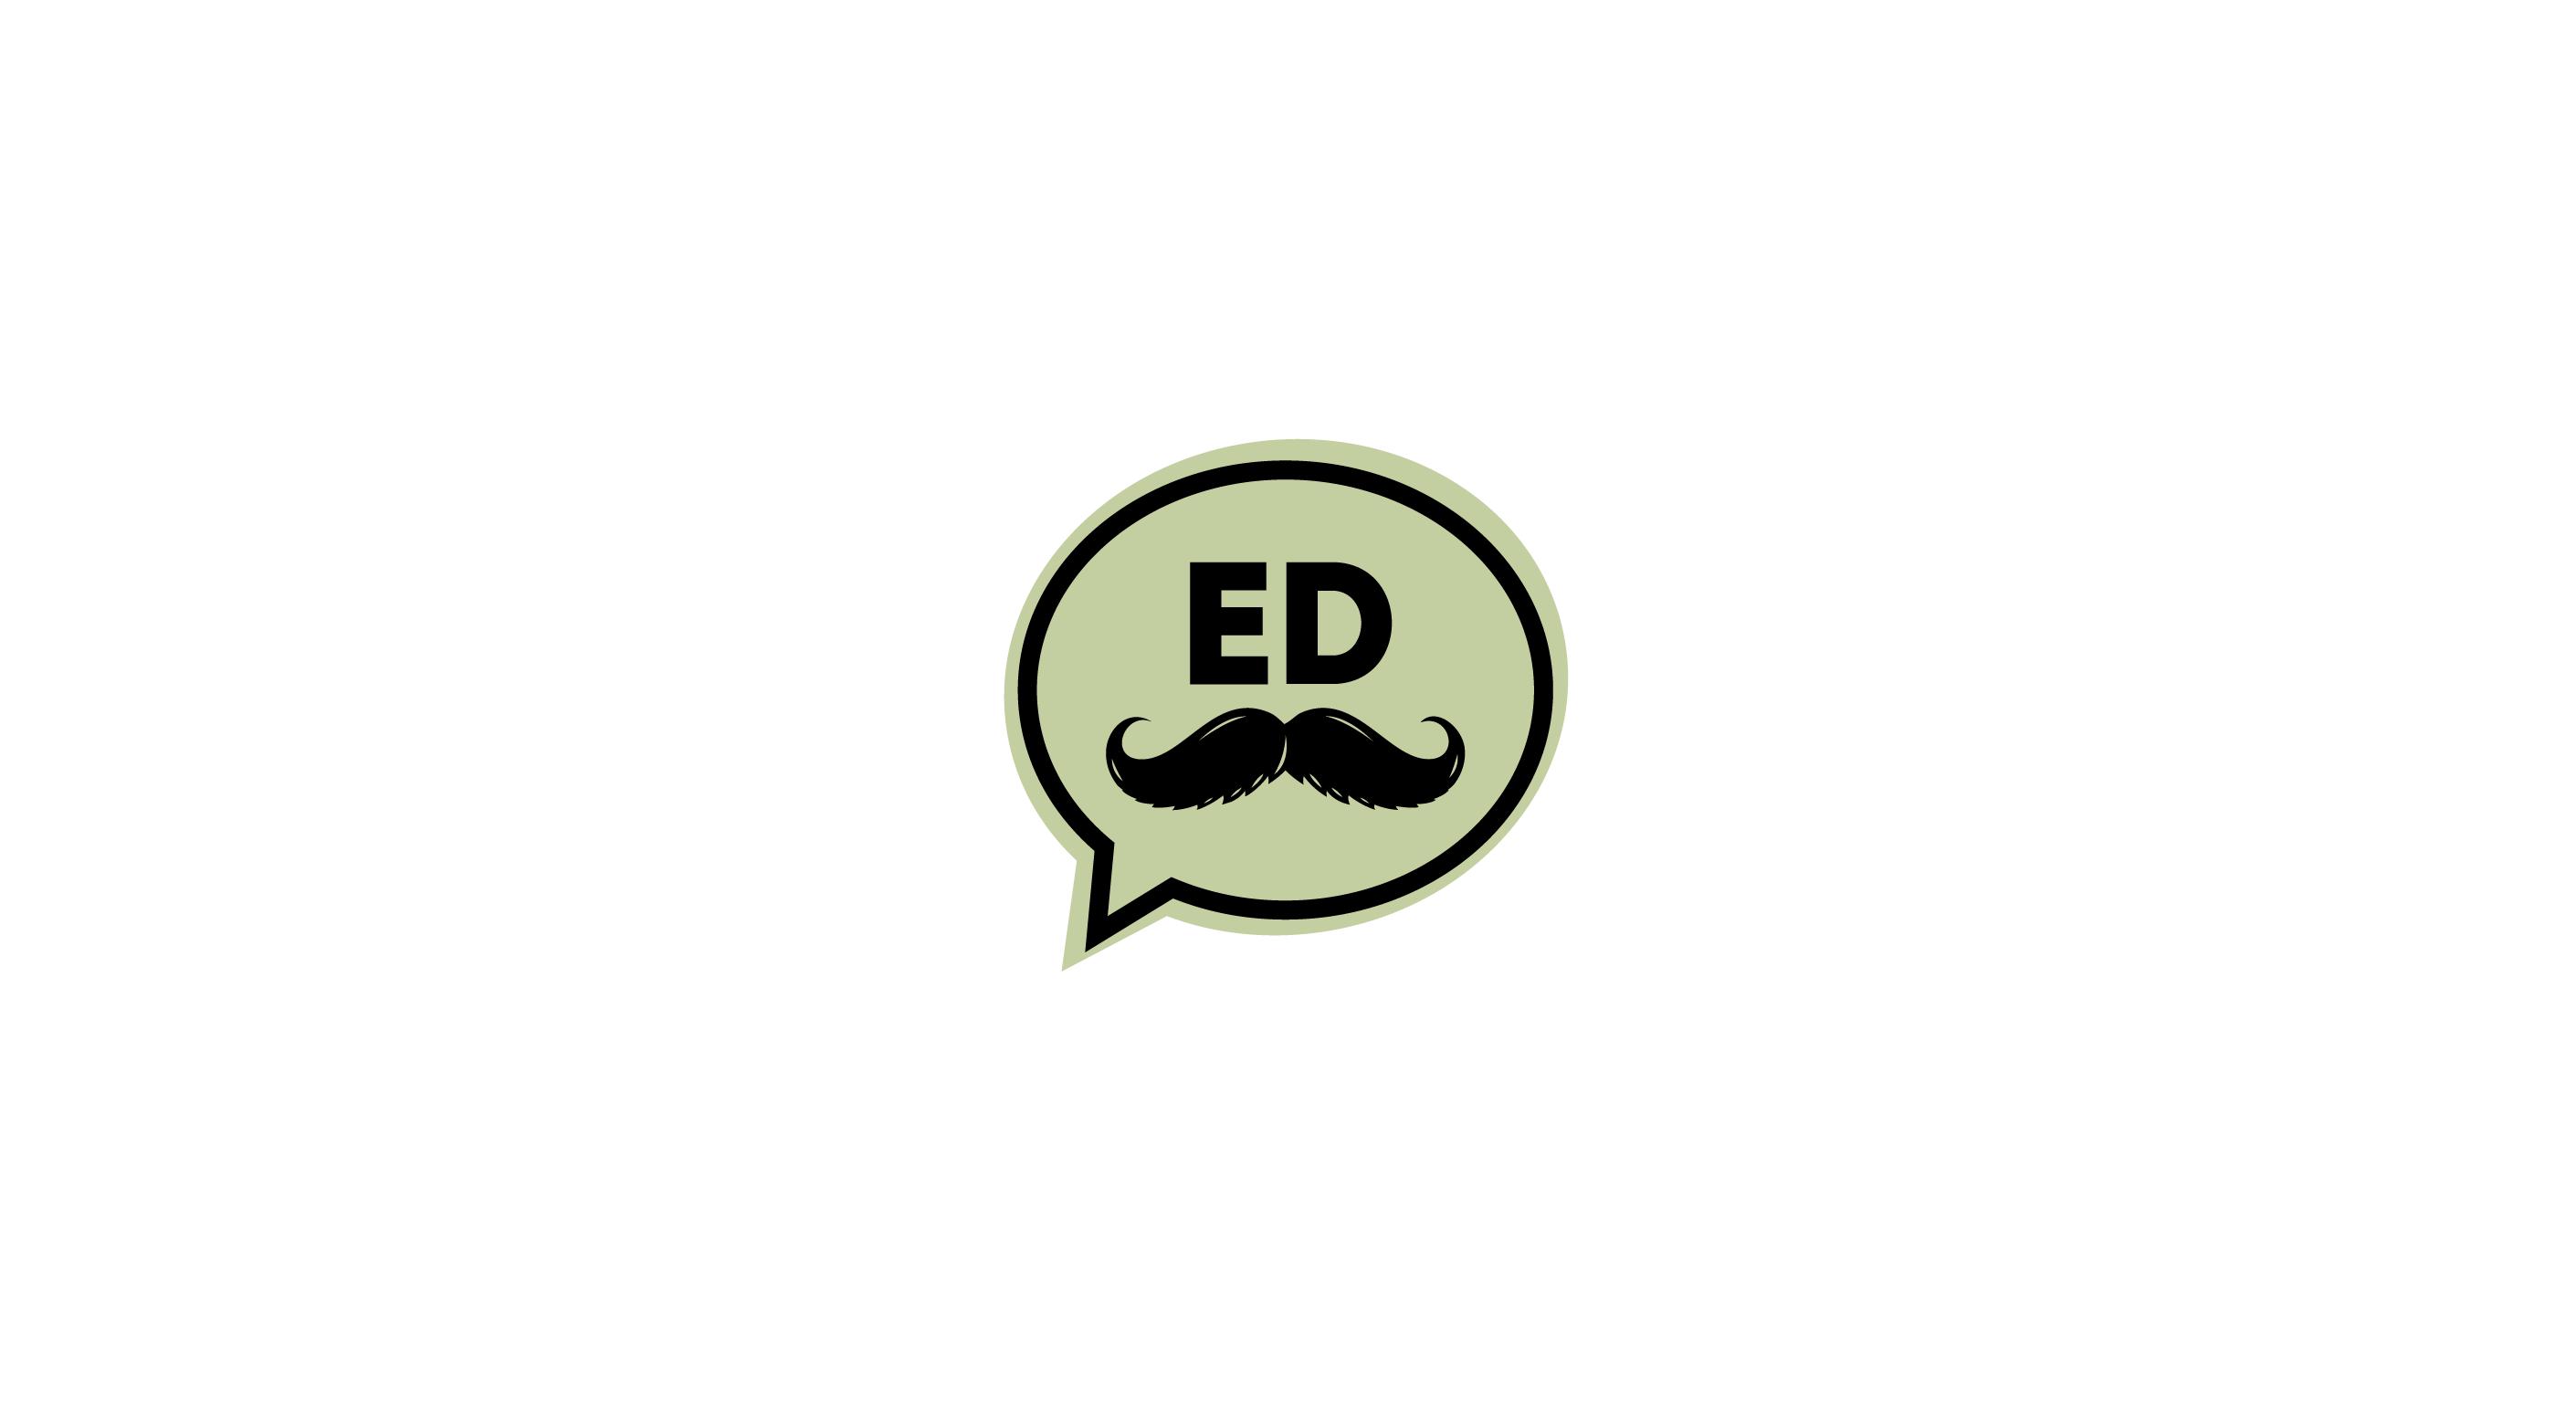 Ed Gilliland